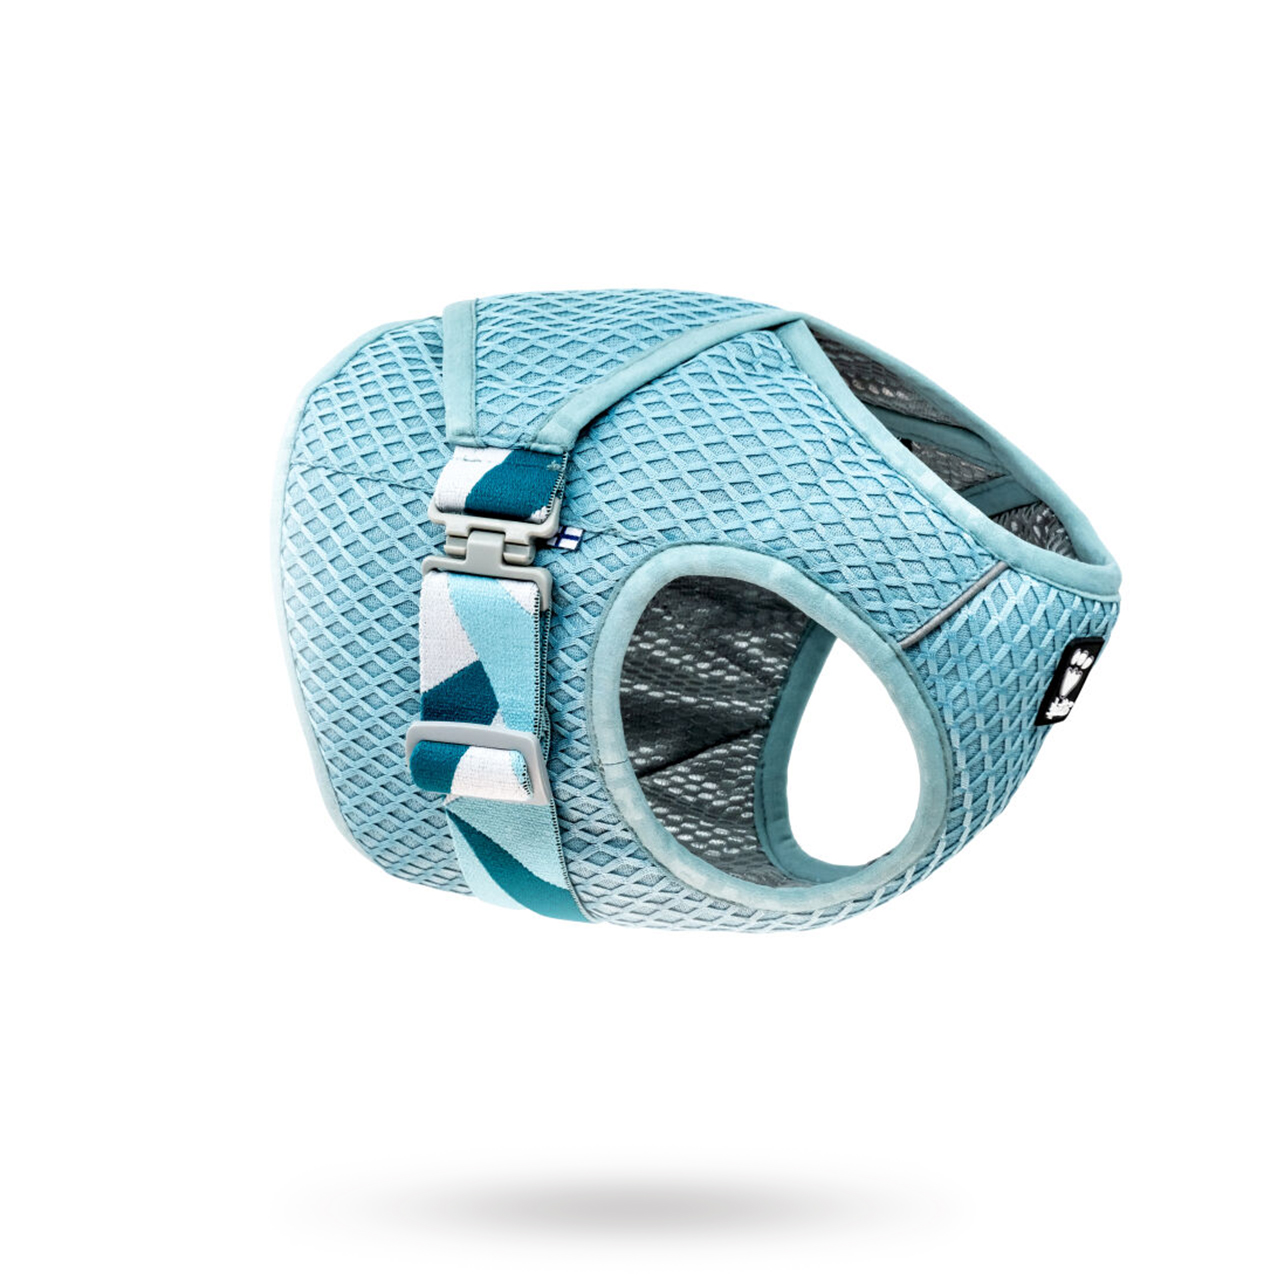 Cooling Wrap Kylväst - Aquamarine